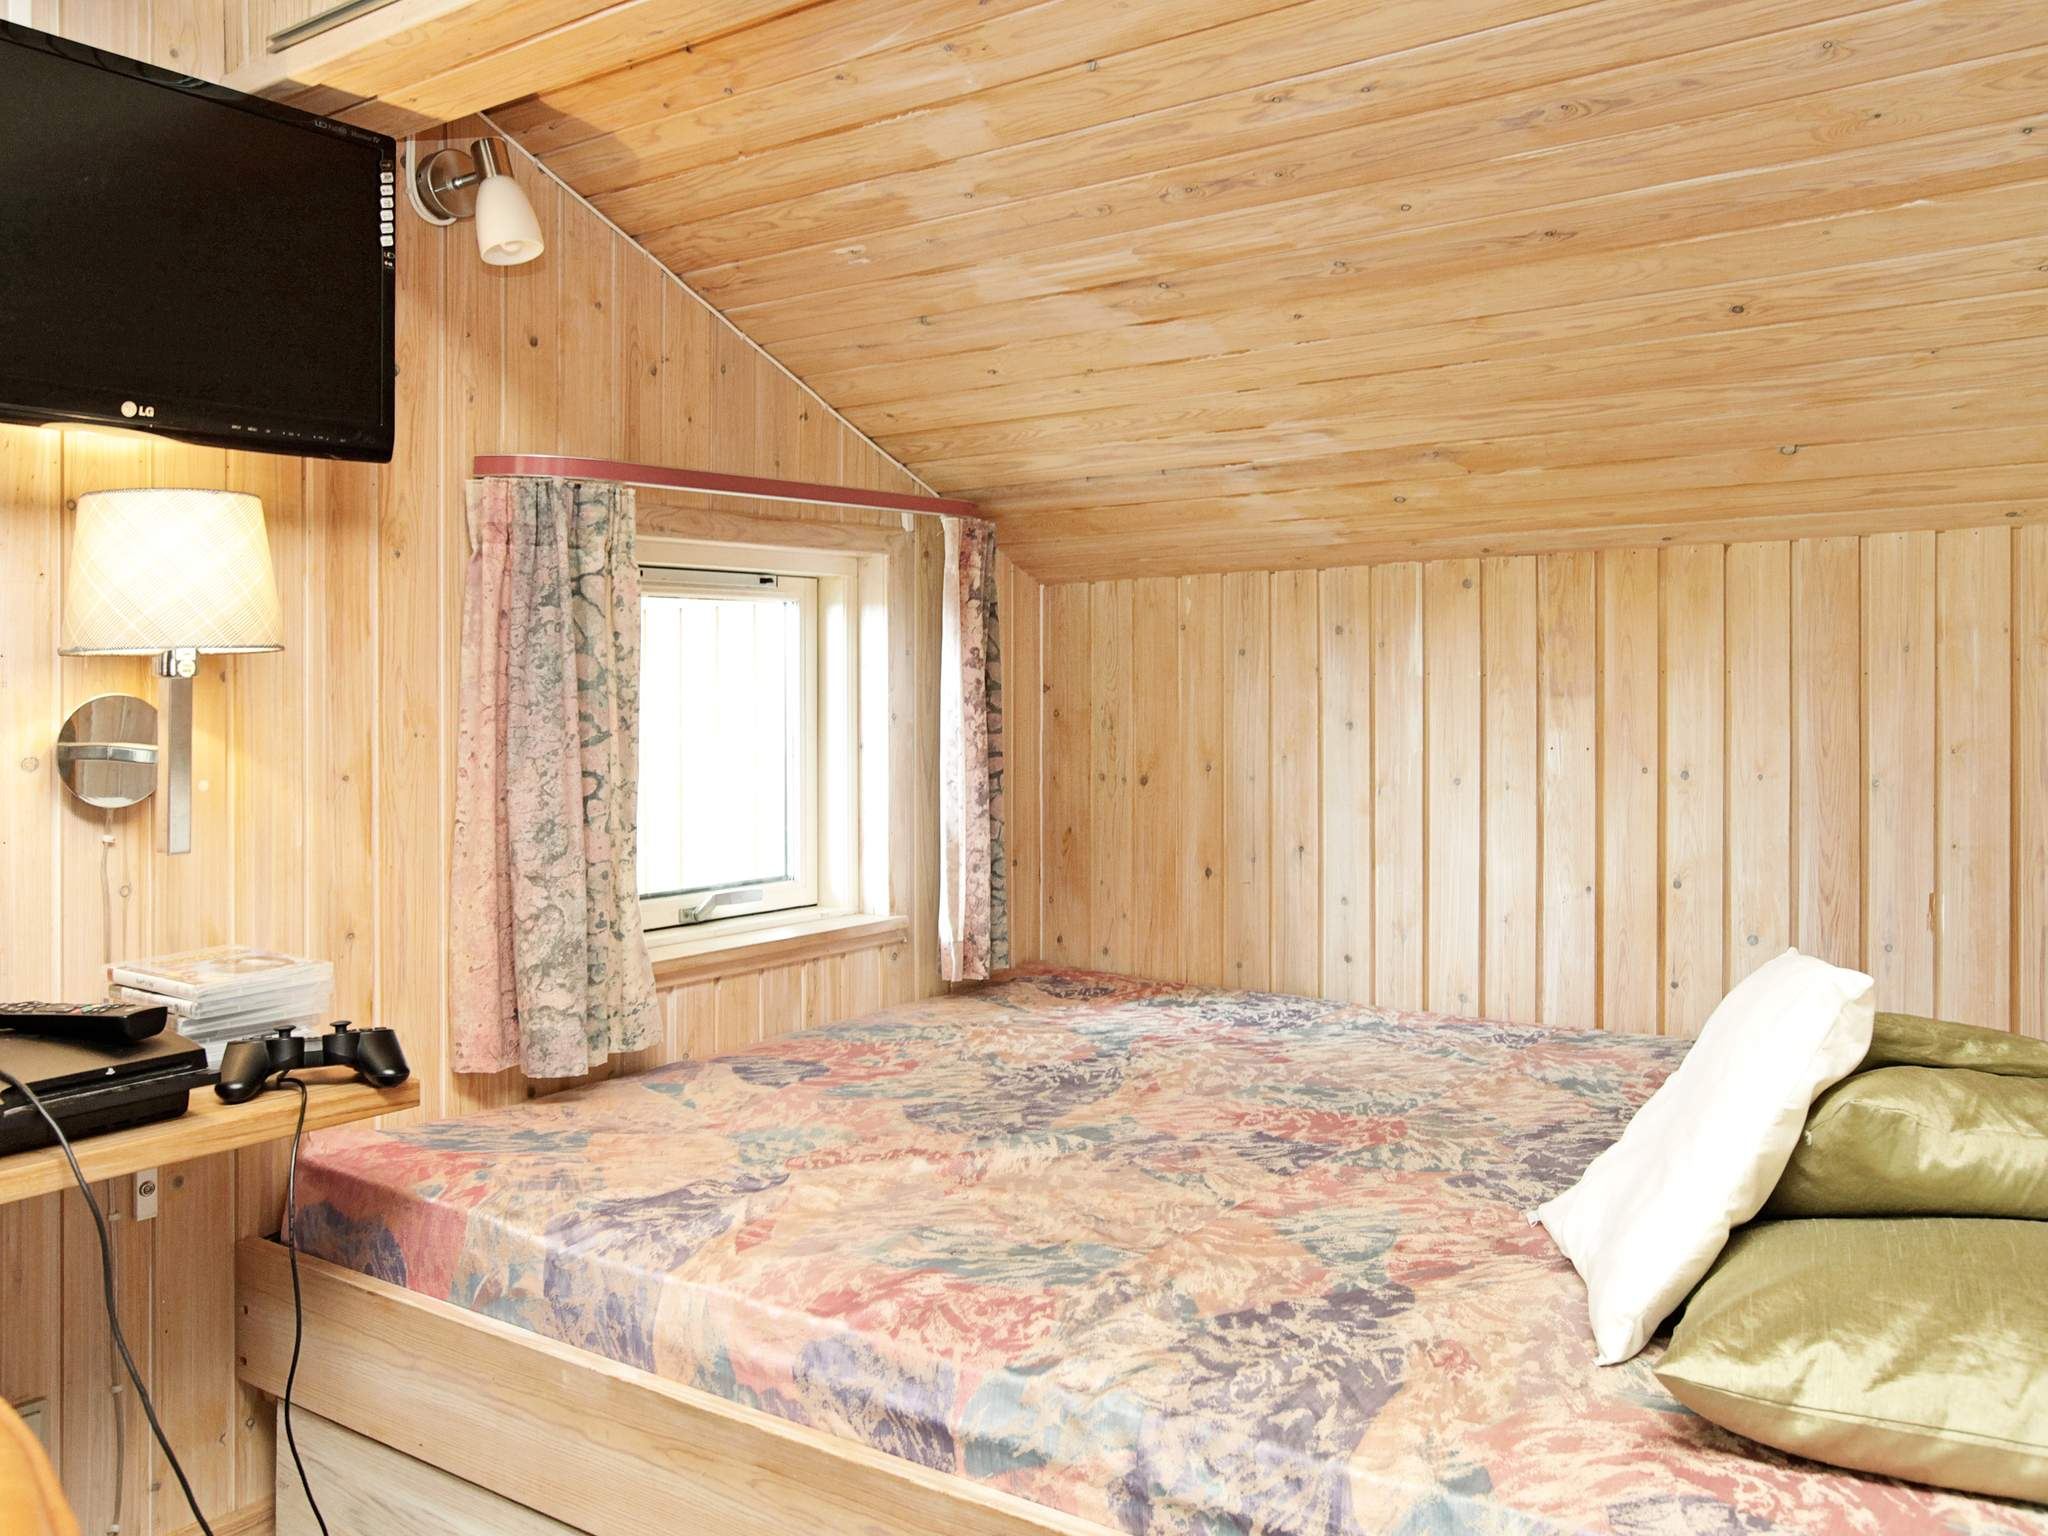 Maison de vacances Falsled (87545), Faldsled, , Fionie, Danemark, image 16